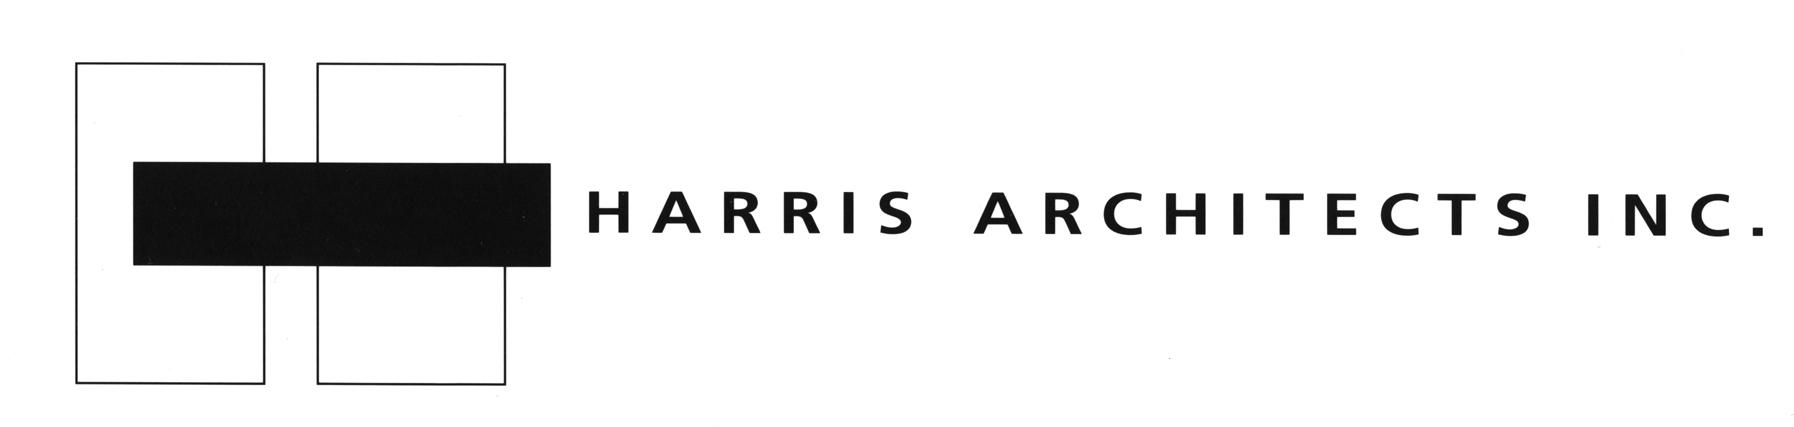 Harris Architects